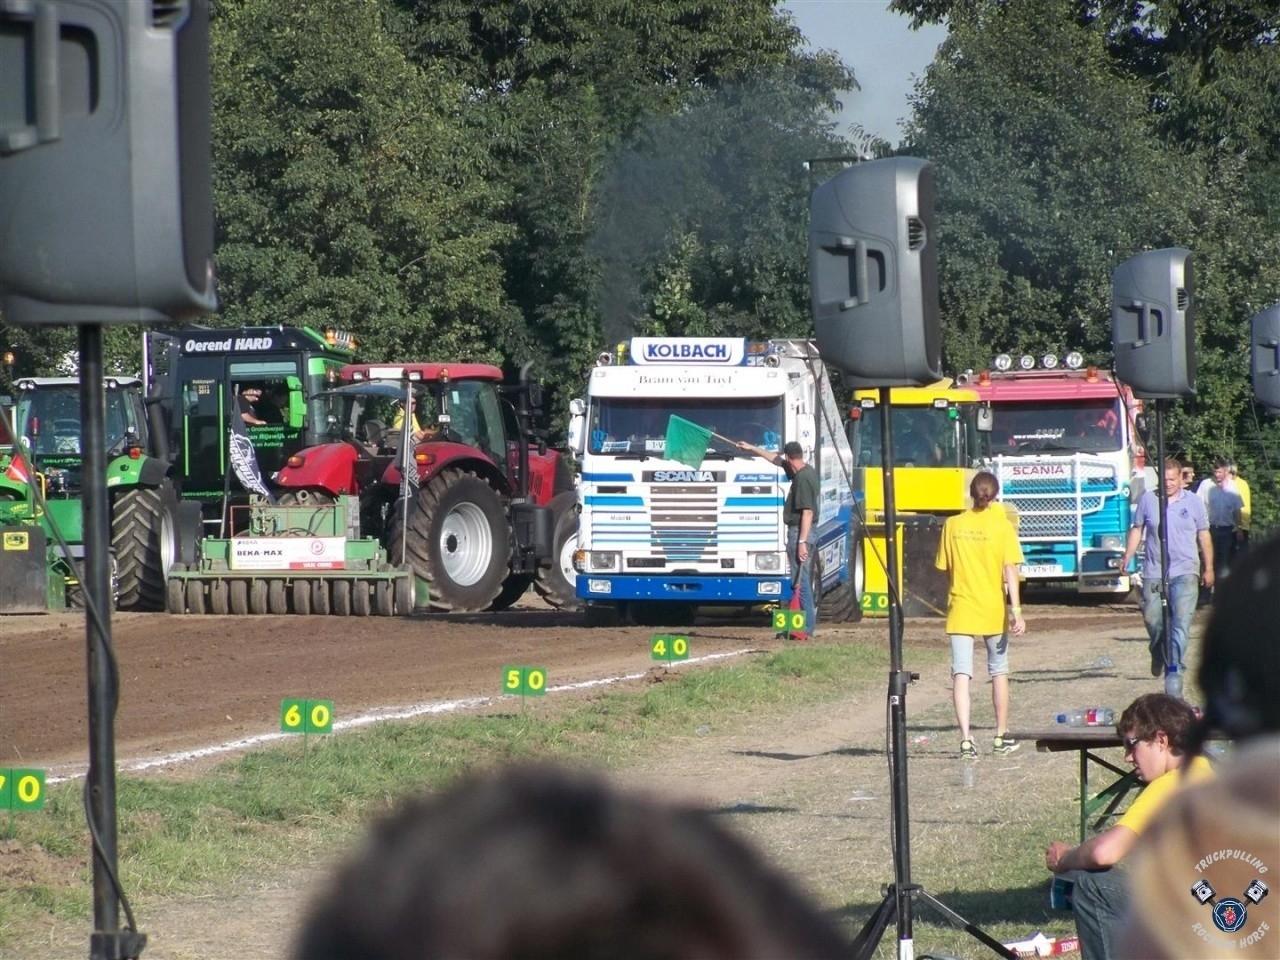 almkerk-2012-019